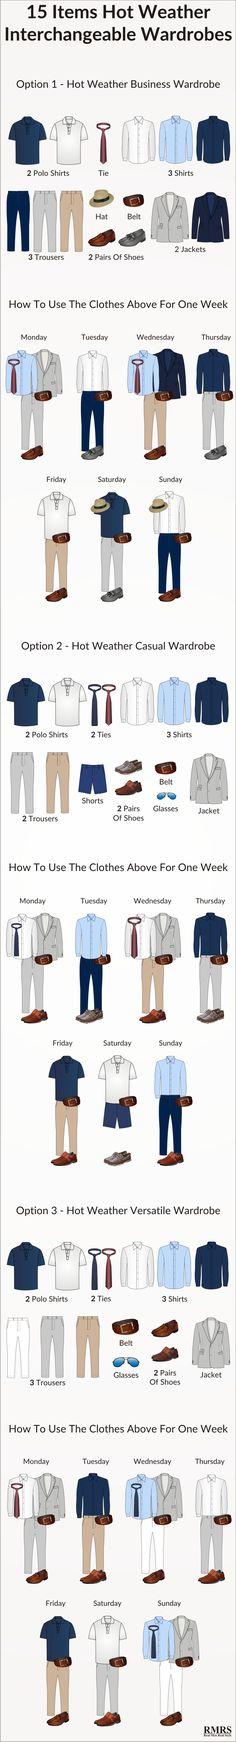 15 Item Summer Wardrobe | Business, Casual & Versatile Wardrobe For The Heat